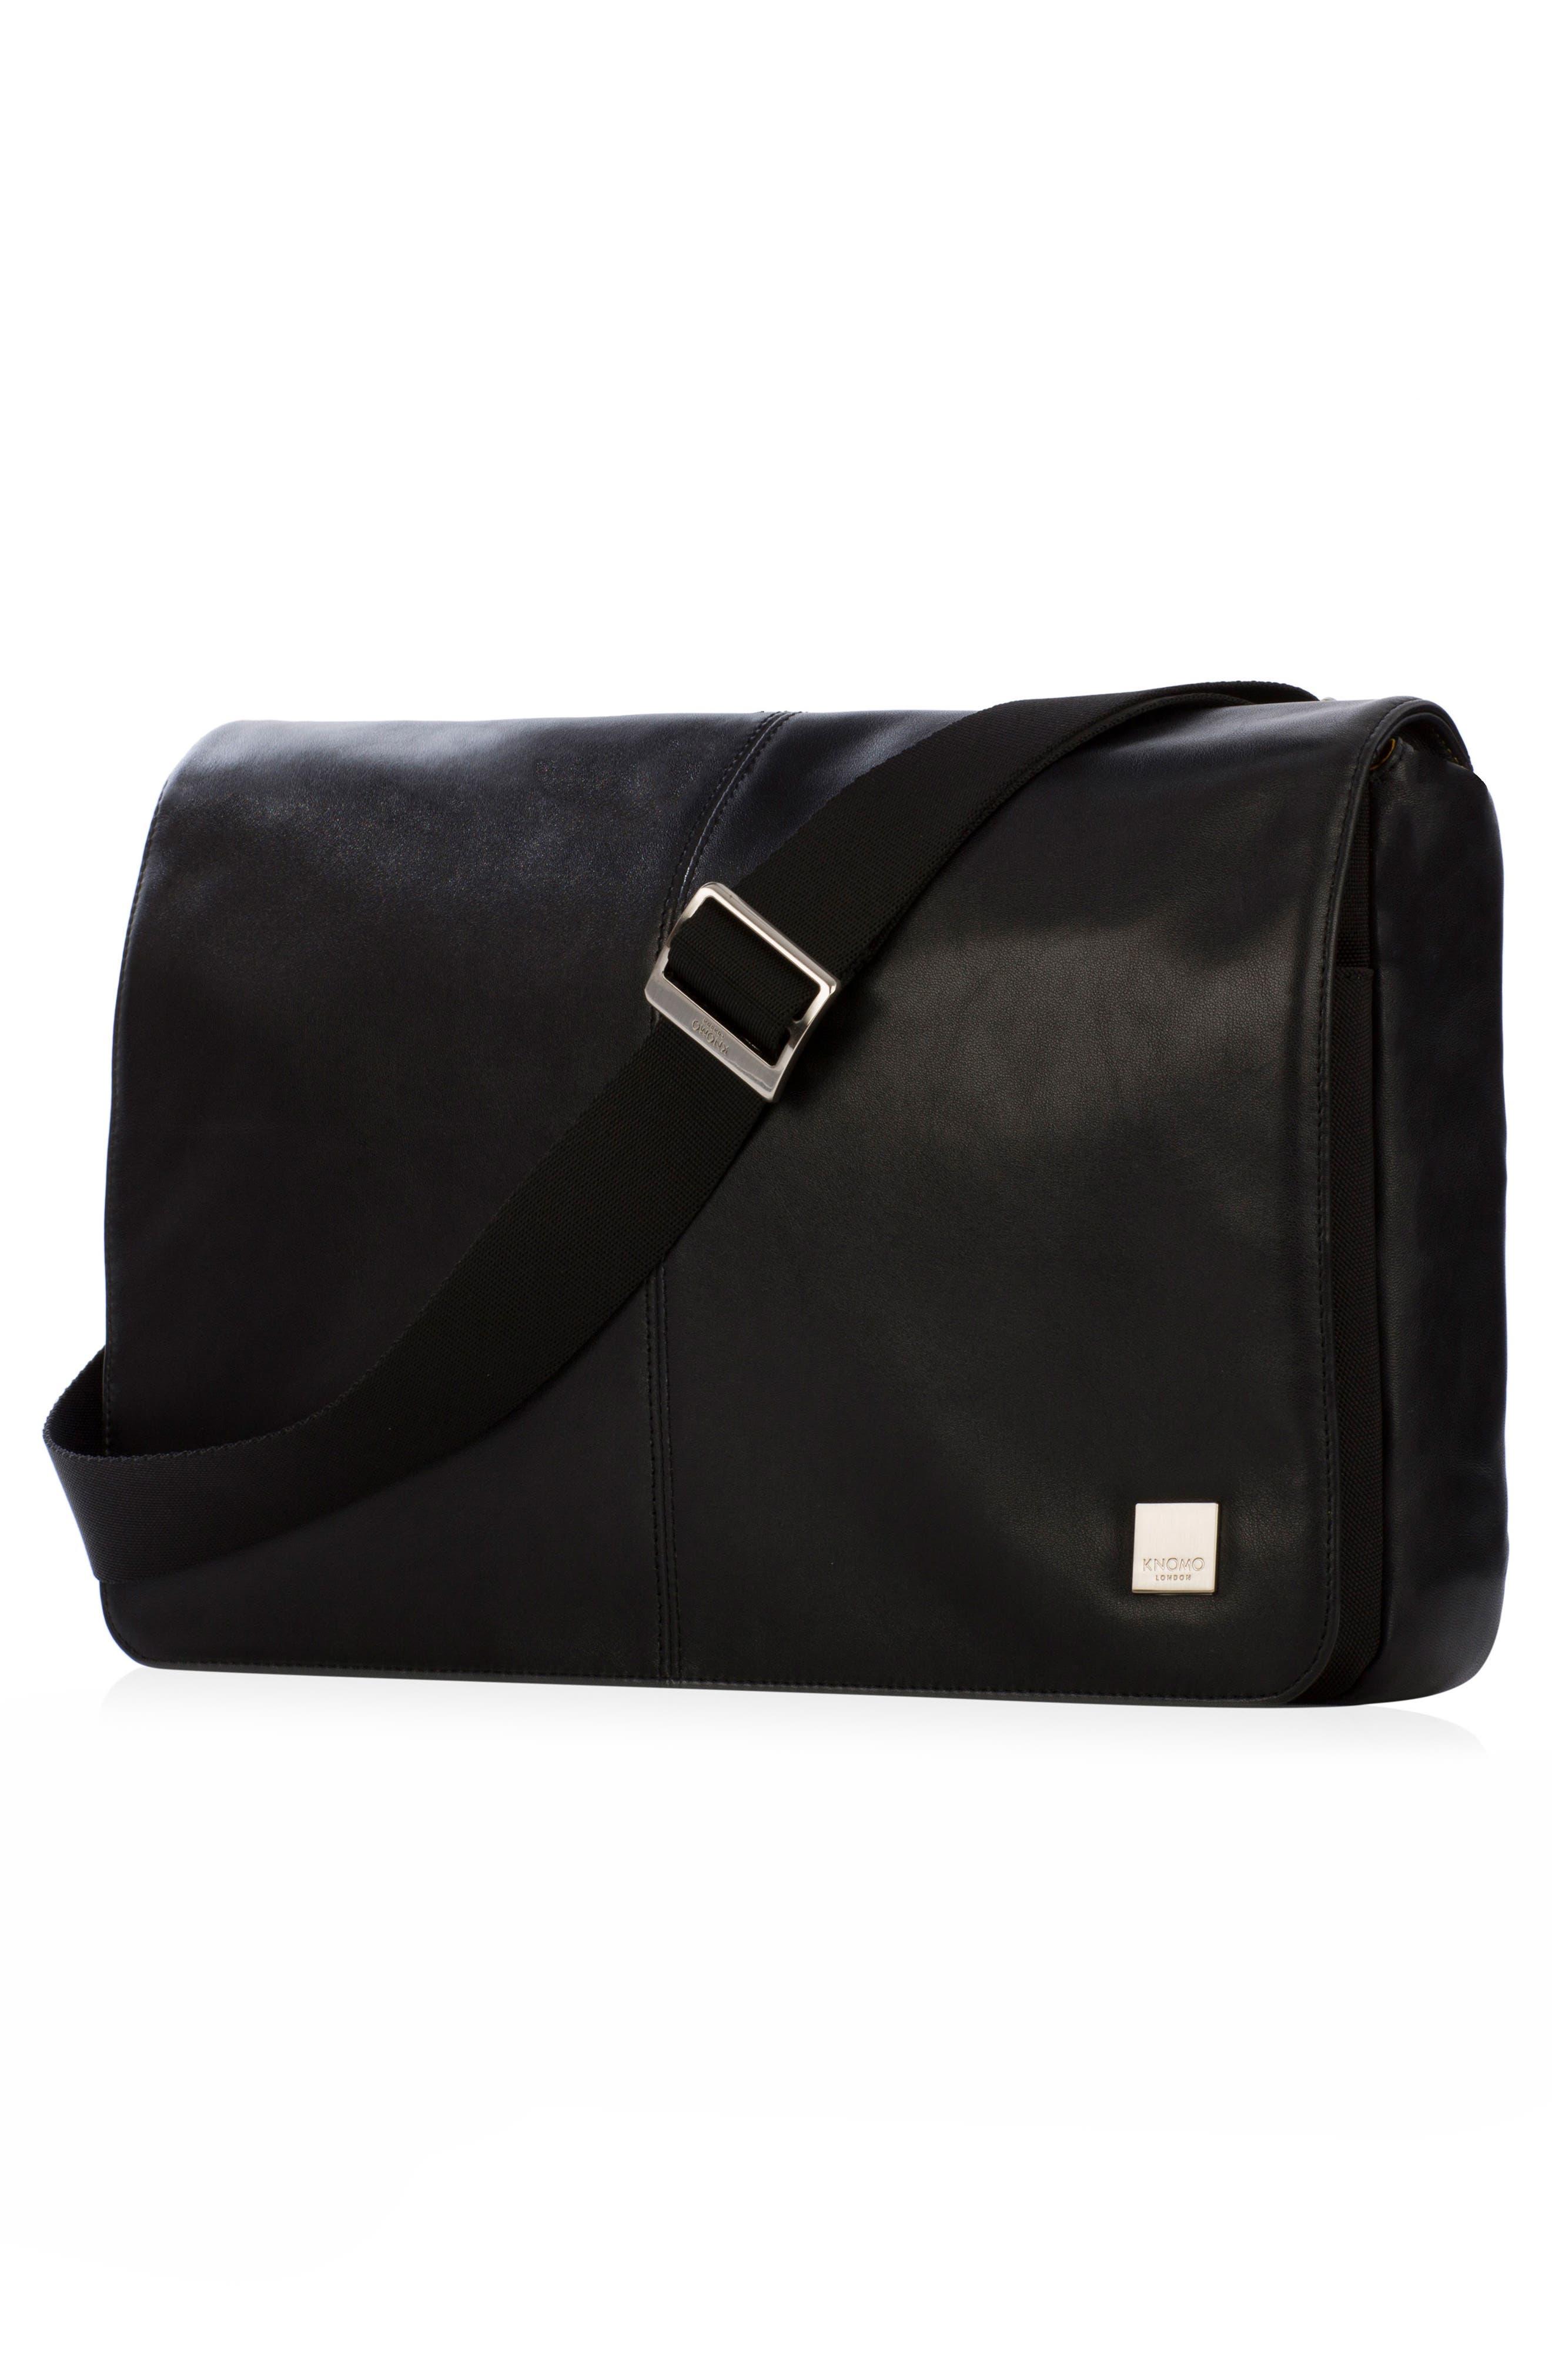 Brompton Kinsale RFID Leather Messenger Bag,                             Alternate thumbnail 4, color,                             001